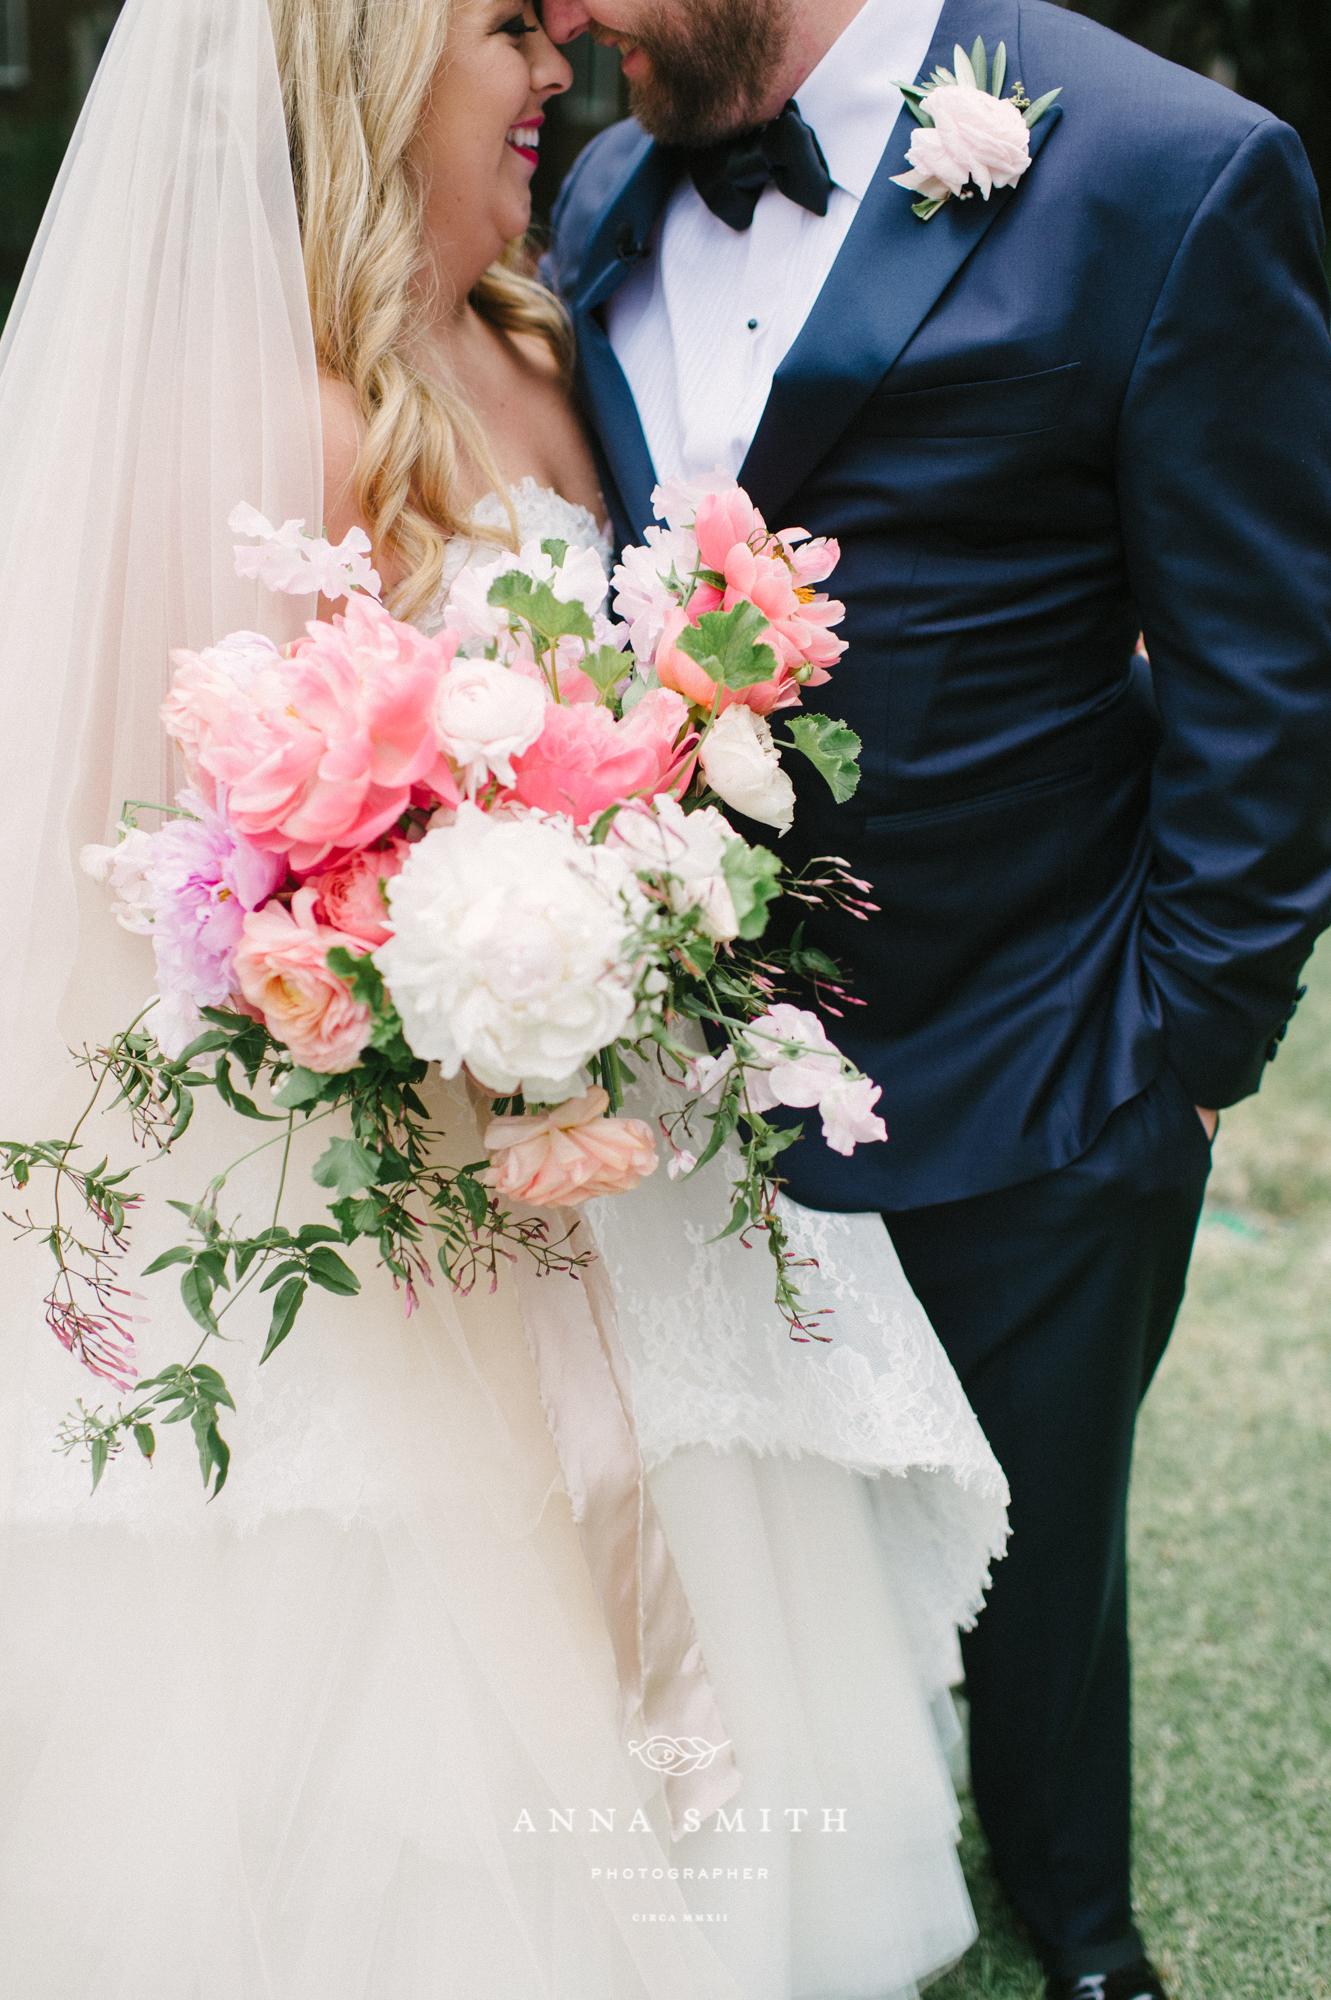 web 17- 4-W-CD-heather brandon wedding perkins adolphus-734.jpg